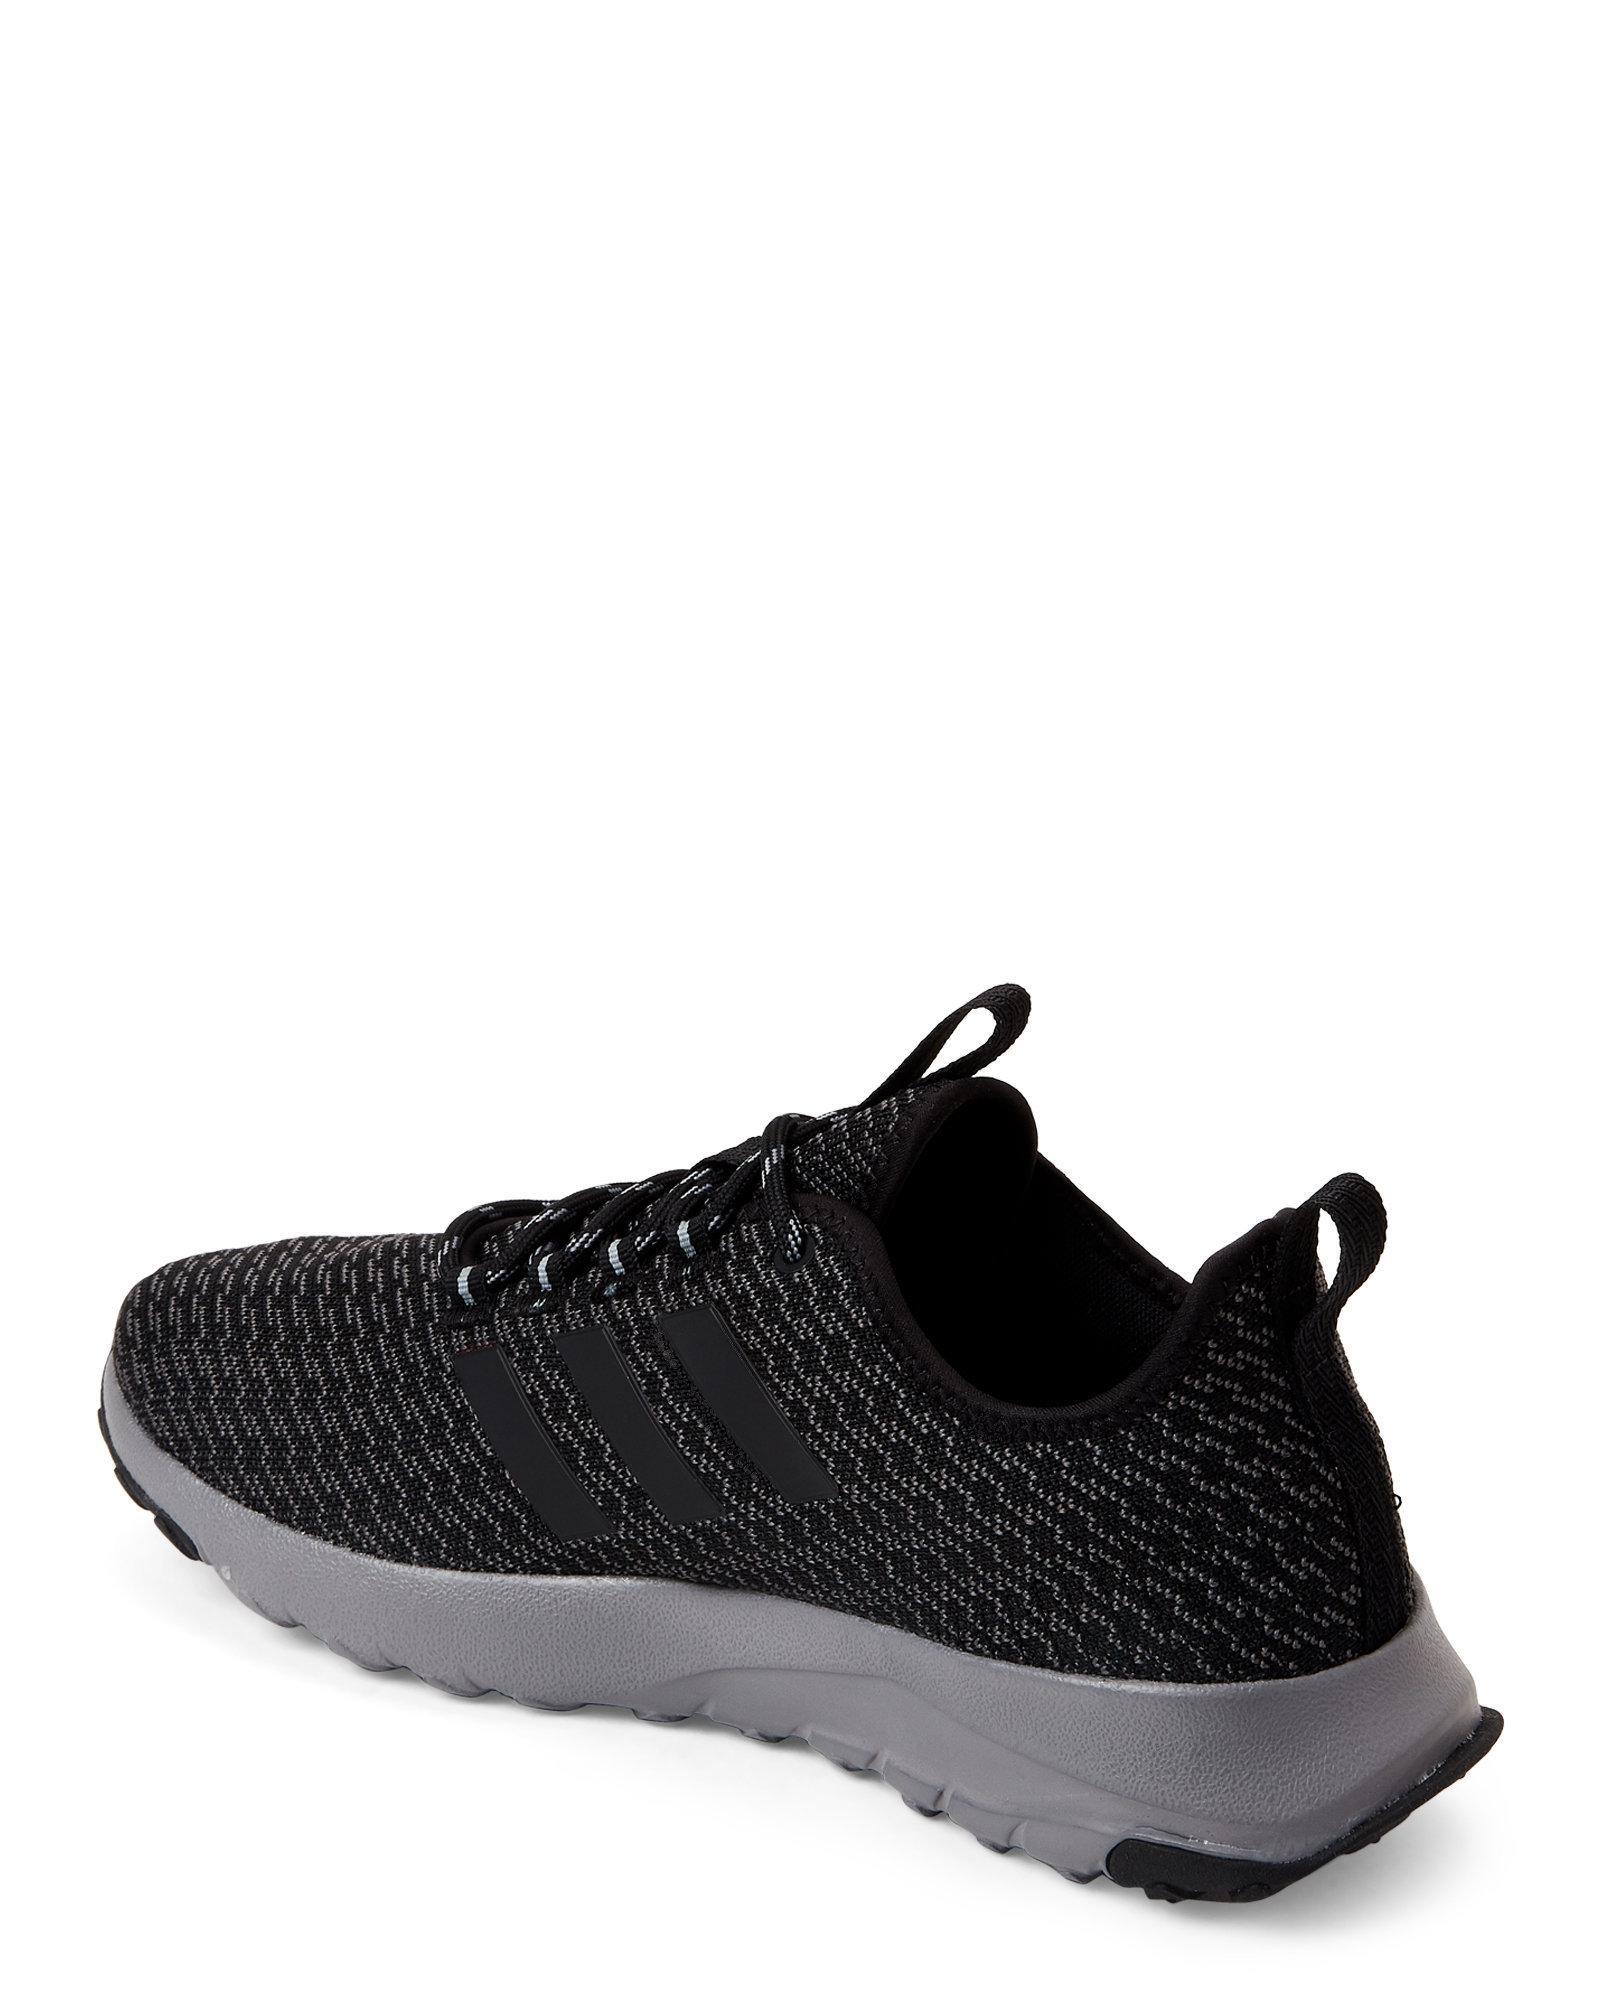 new arrival 5fdb8 0d2b6 ... cheap adidas black grey neo cloudfoam superflex tr sneakers lyst. view  fullscreen 6c1e7 7e360